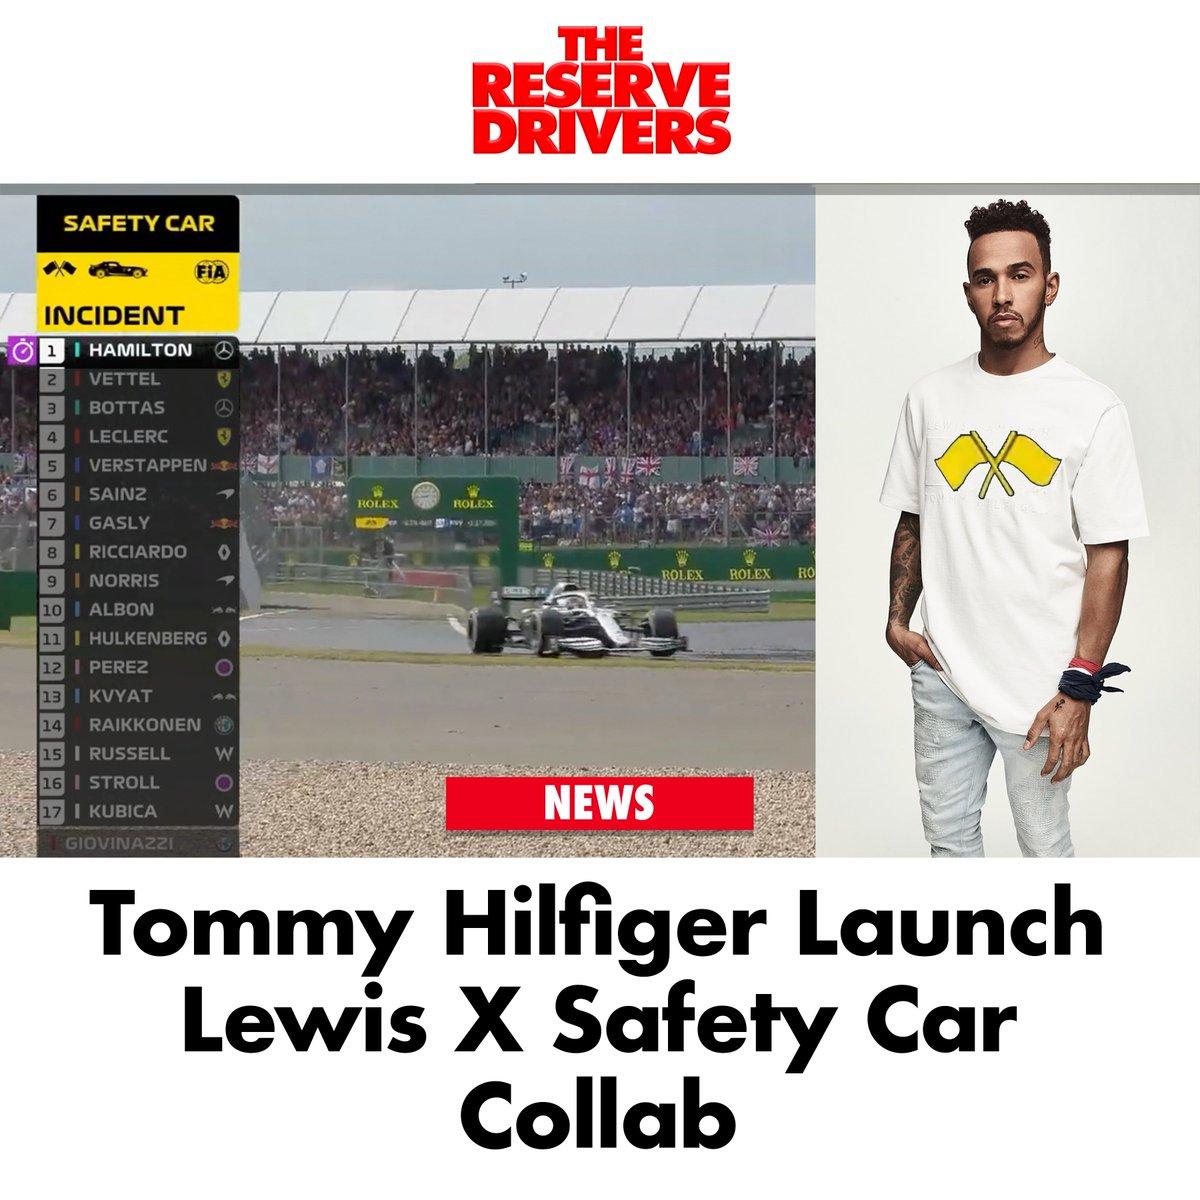 "#BREAKING ""I'm sending a tee to @antogiovinazzi99 to say thanks,"" Lewis said. #LewisXSafetyCar #BritishGP🇬🇧"